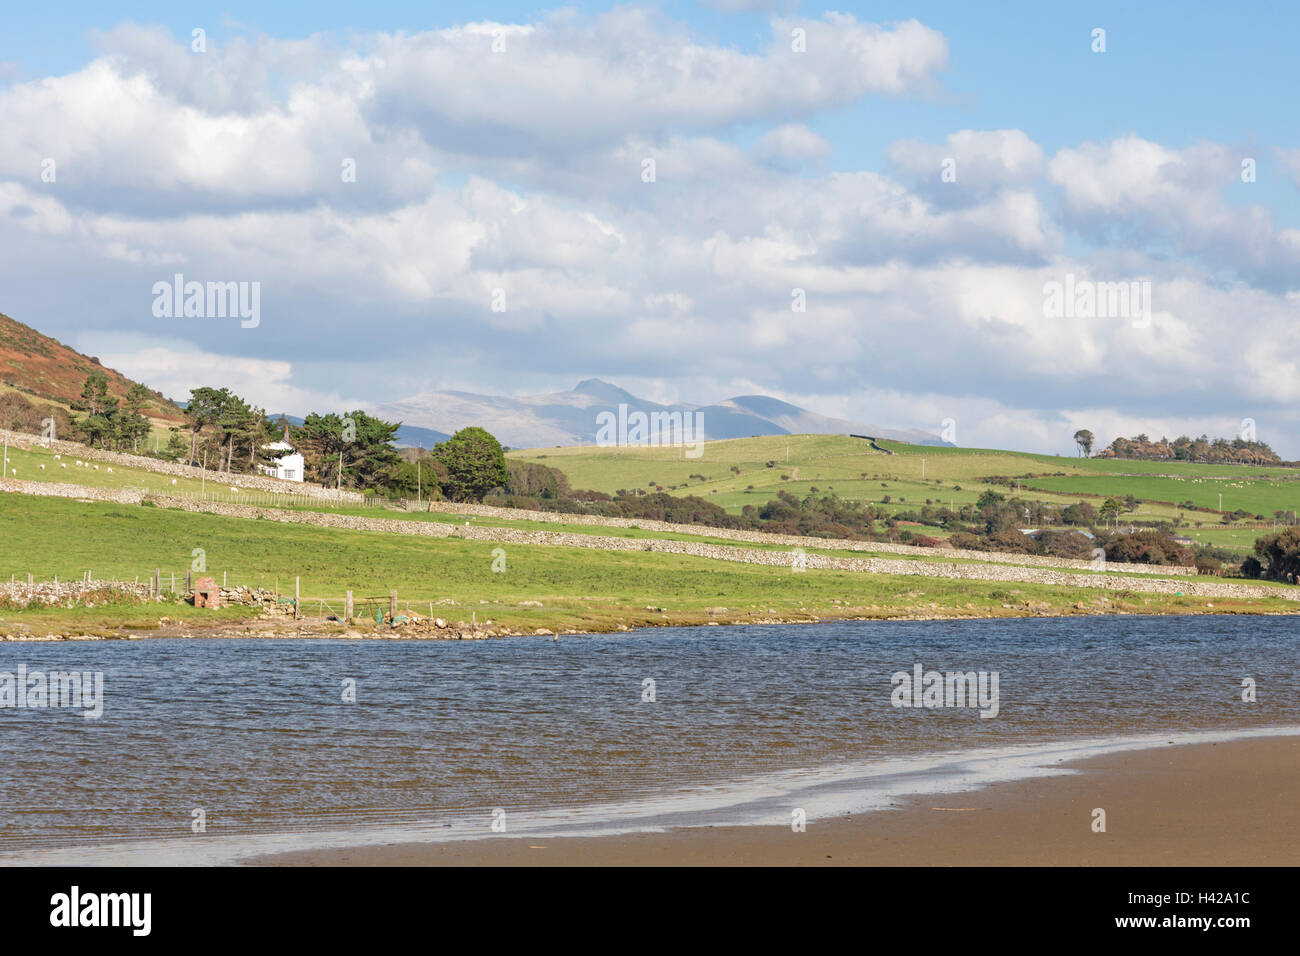 Broad Water on the Afon Dysynni near the coastal town of Tywyn, Cardigan Bay. Merionethshire, North Wales. - Stock Image